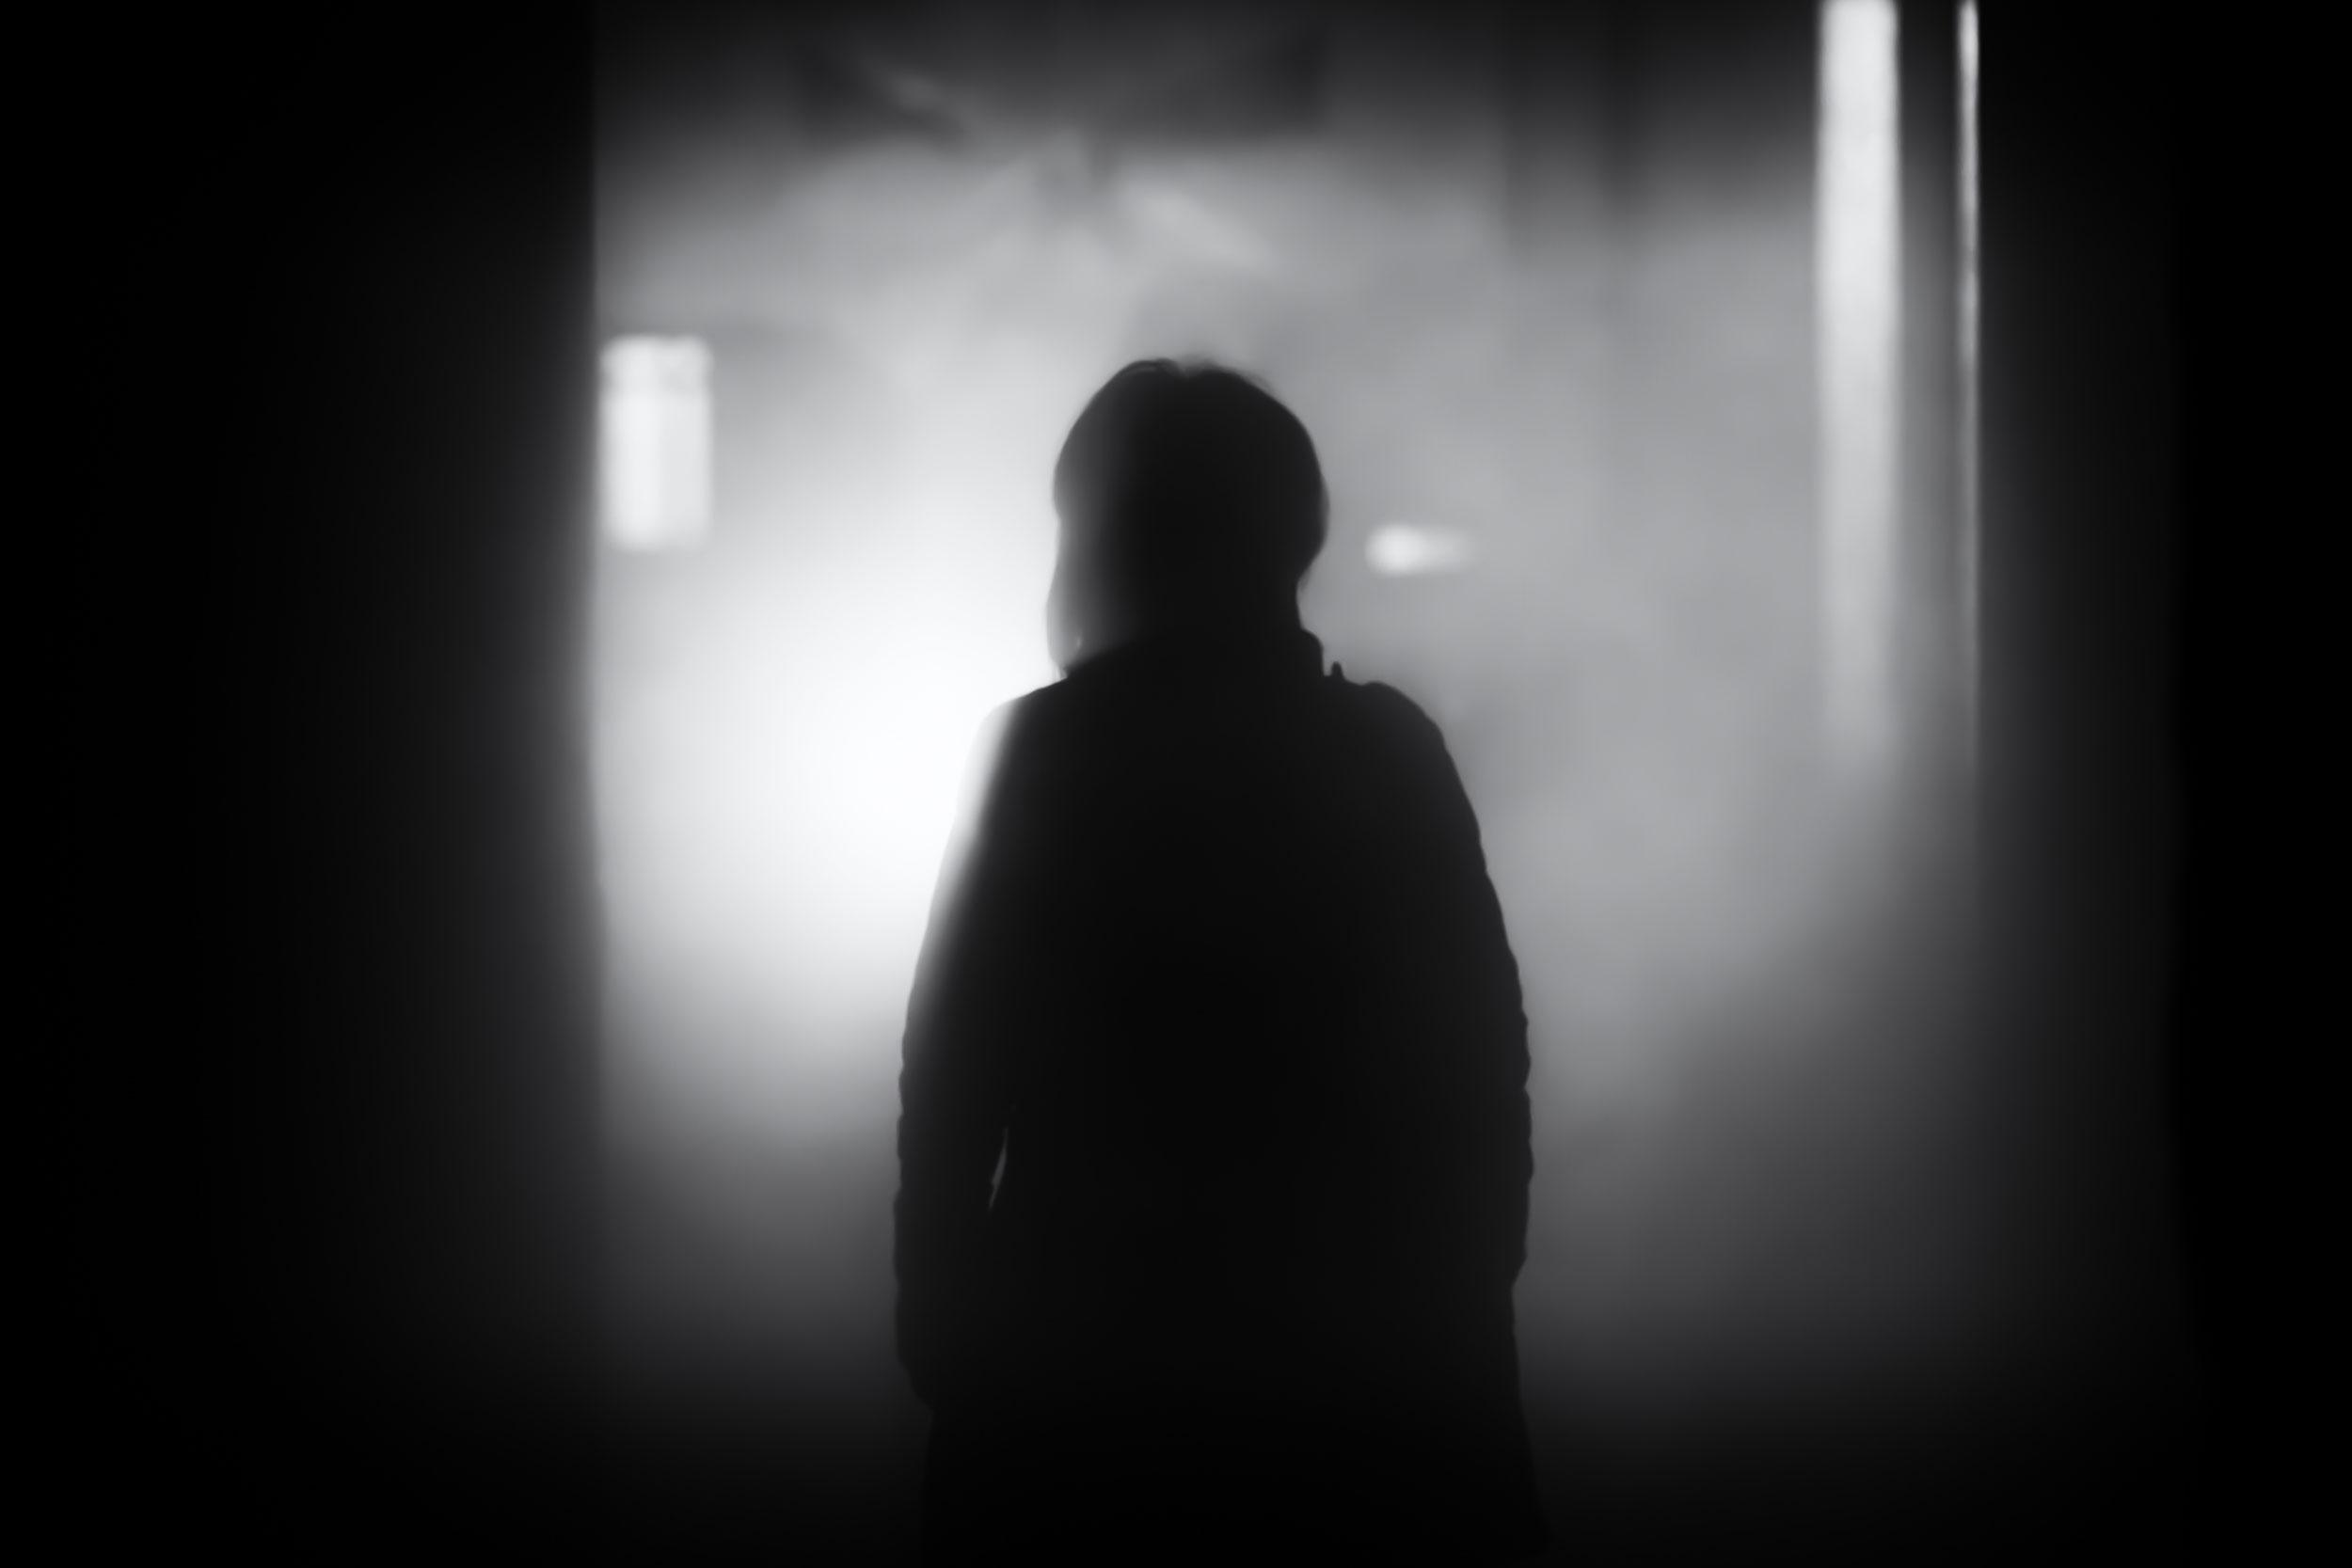 depresion-tristeza